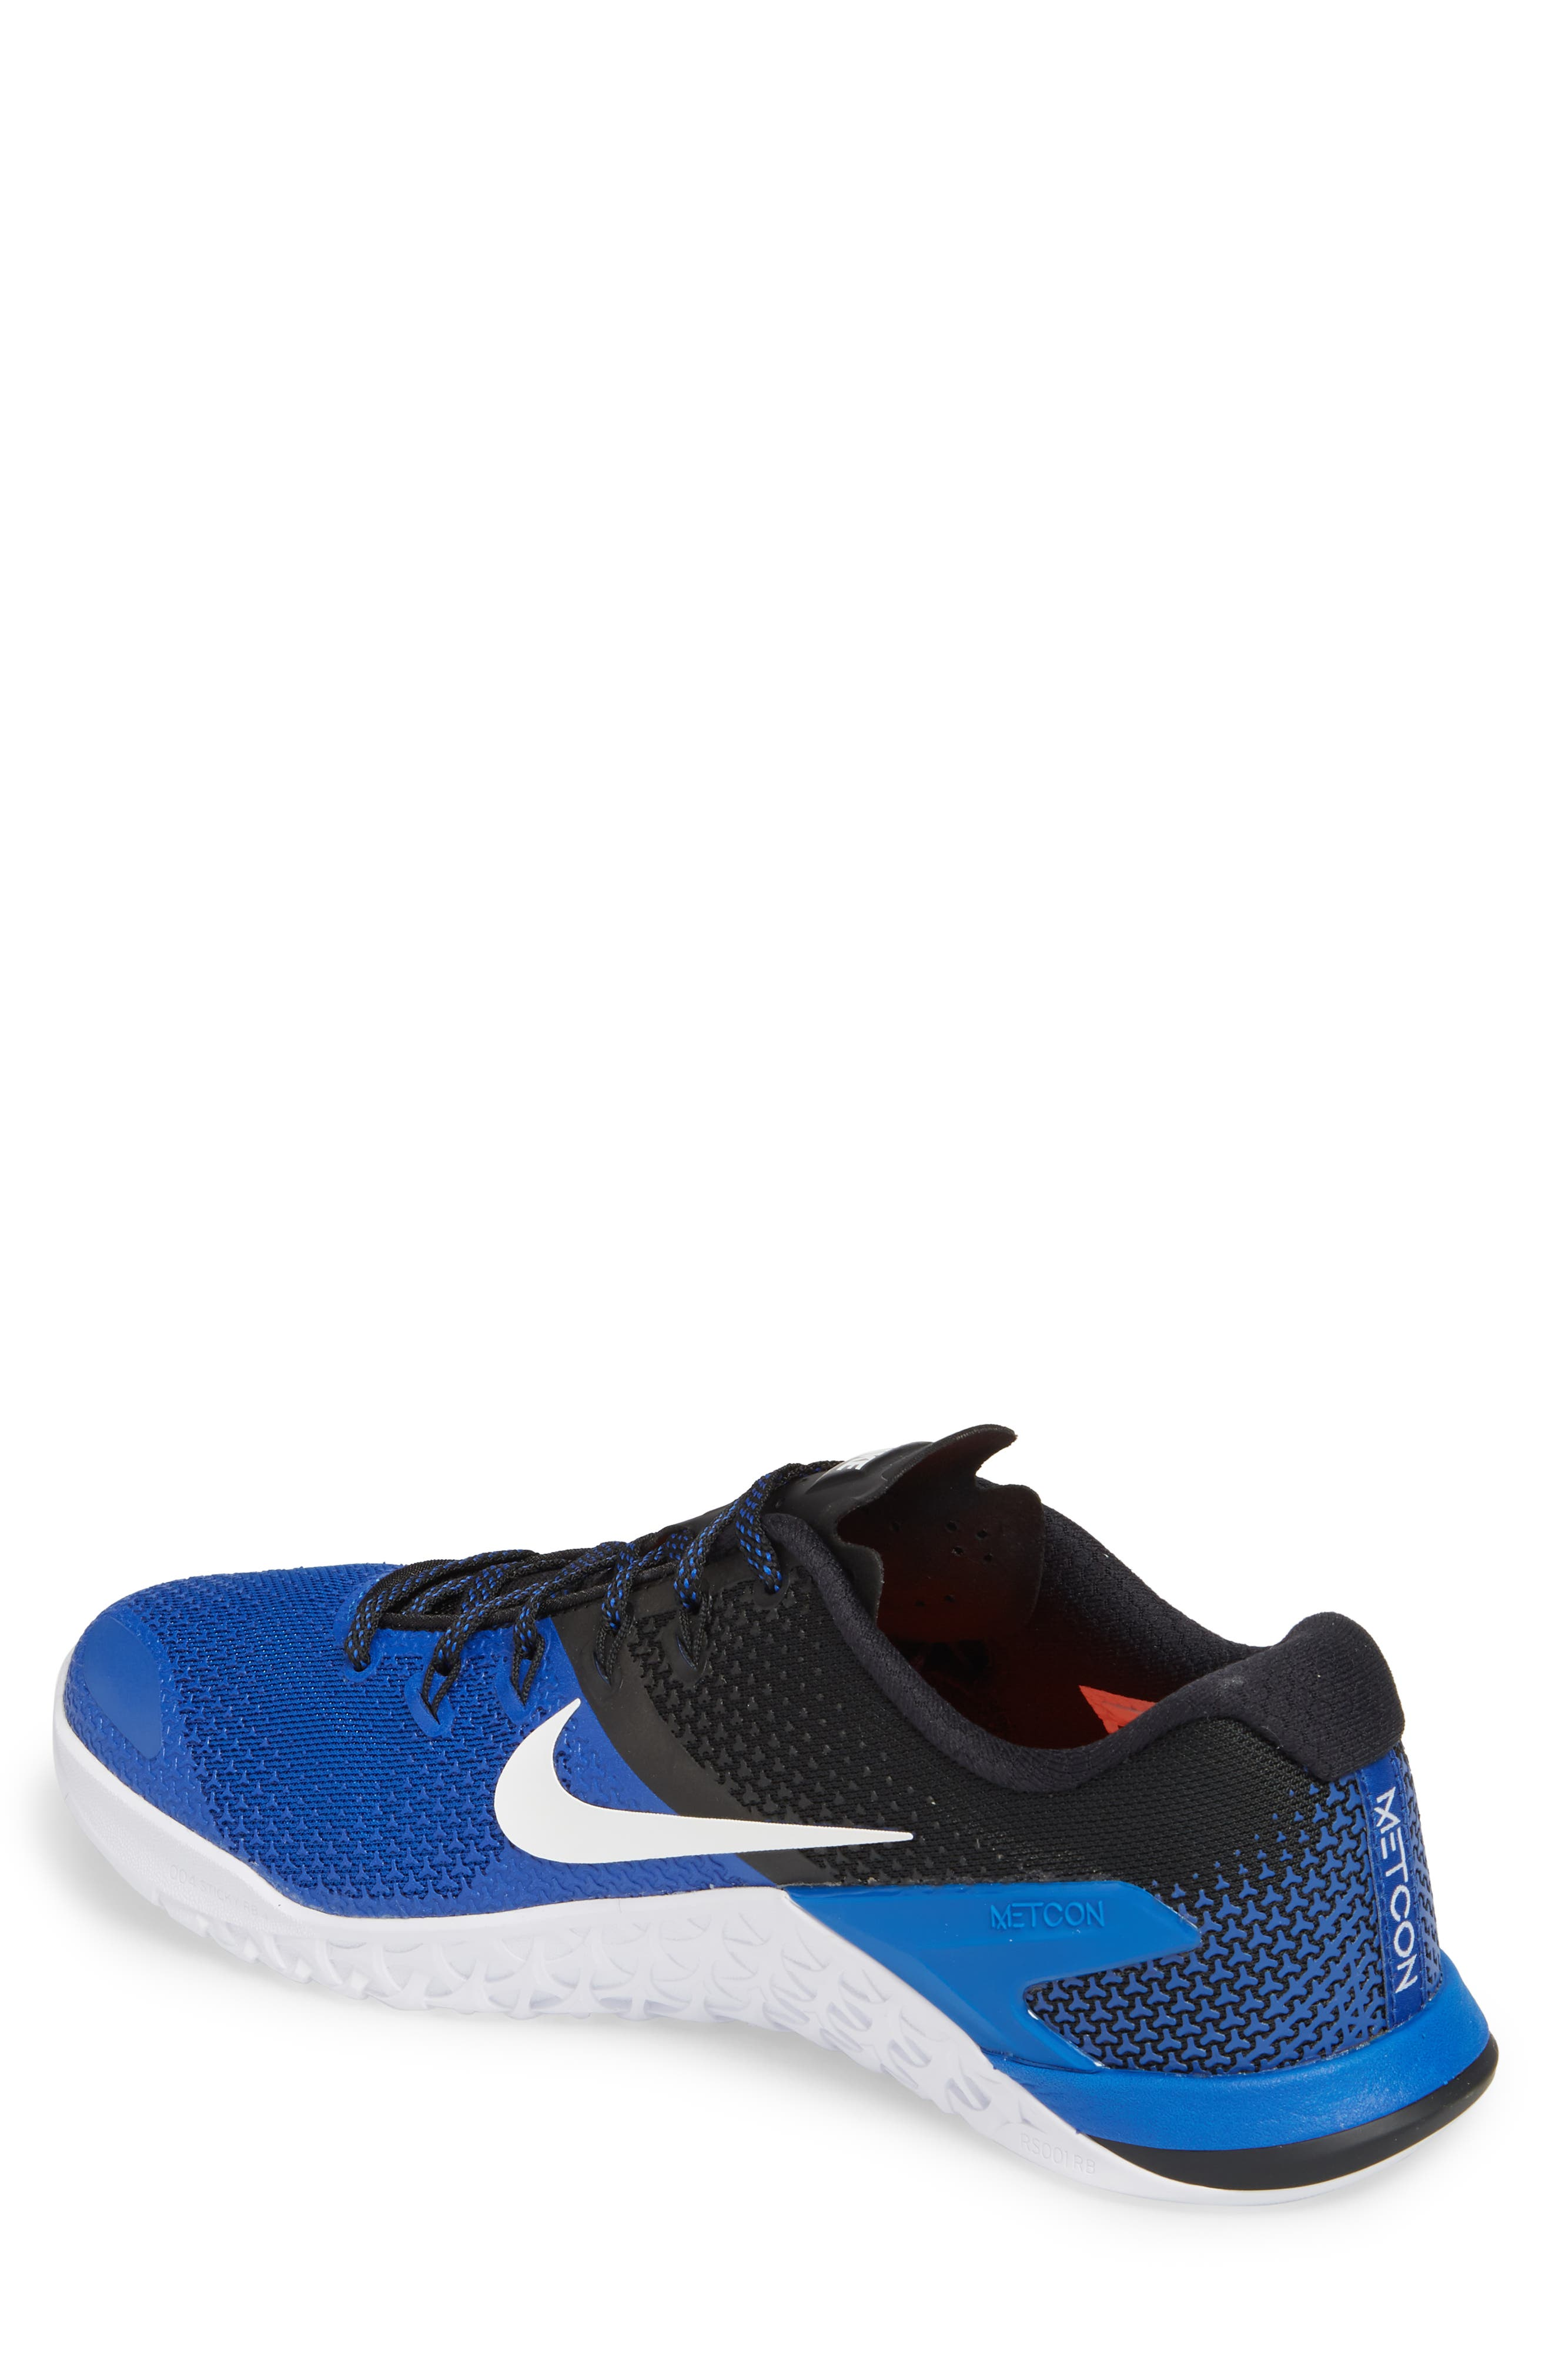 Metcon 4 Training Shoe,                             Alternate thumbnail 2, color,                             GAME ROYAL/ WHITE/ BLACK